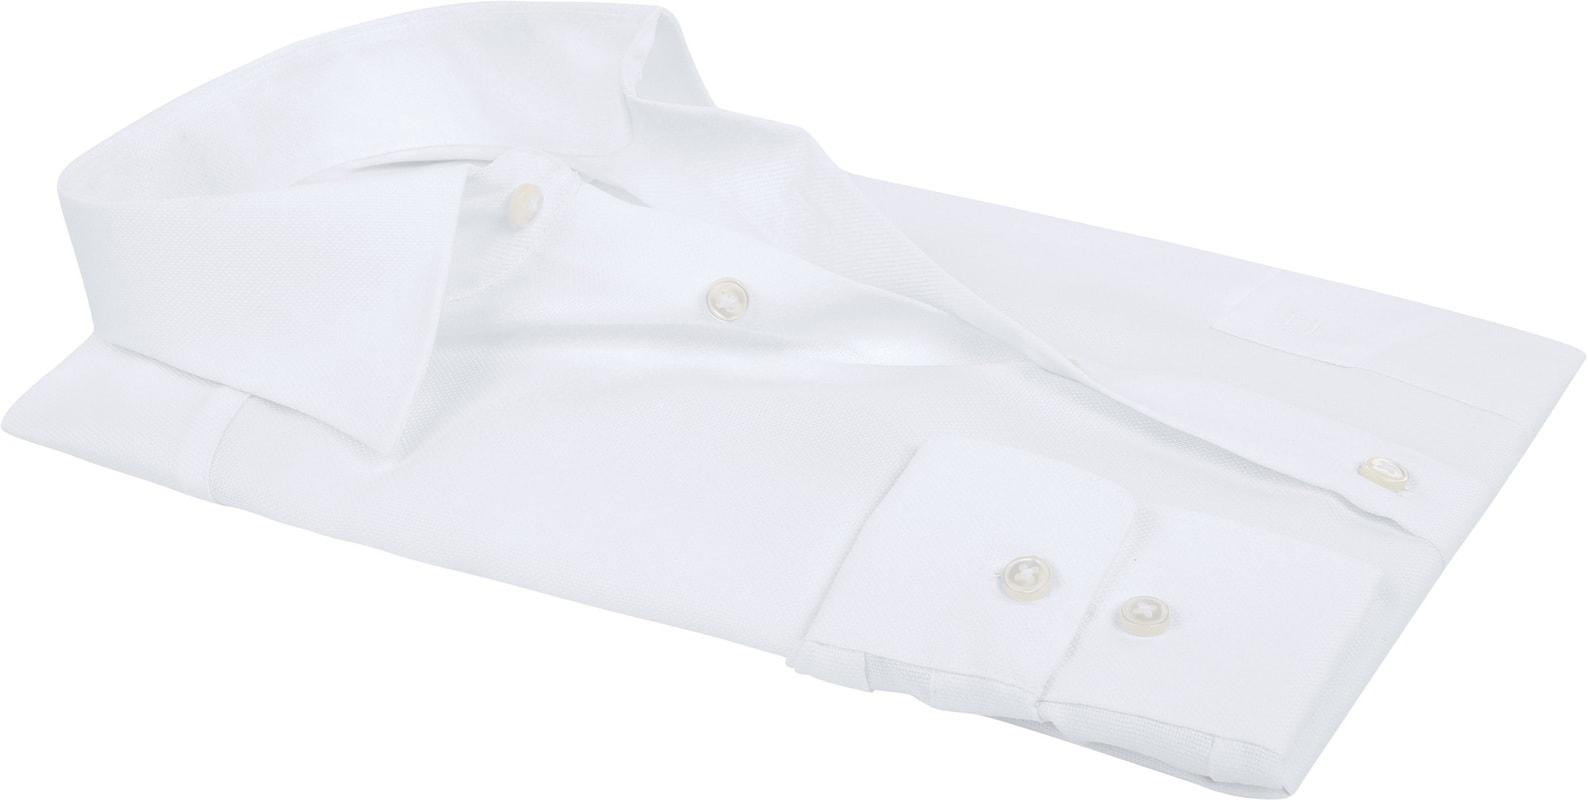 Olymp Luxor Shirt Modern Fit White